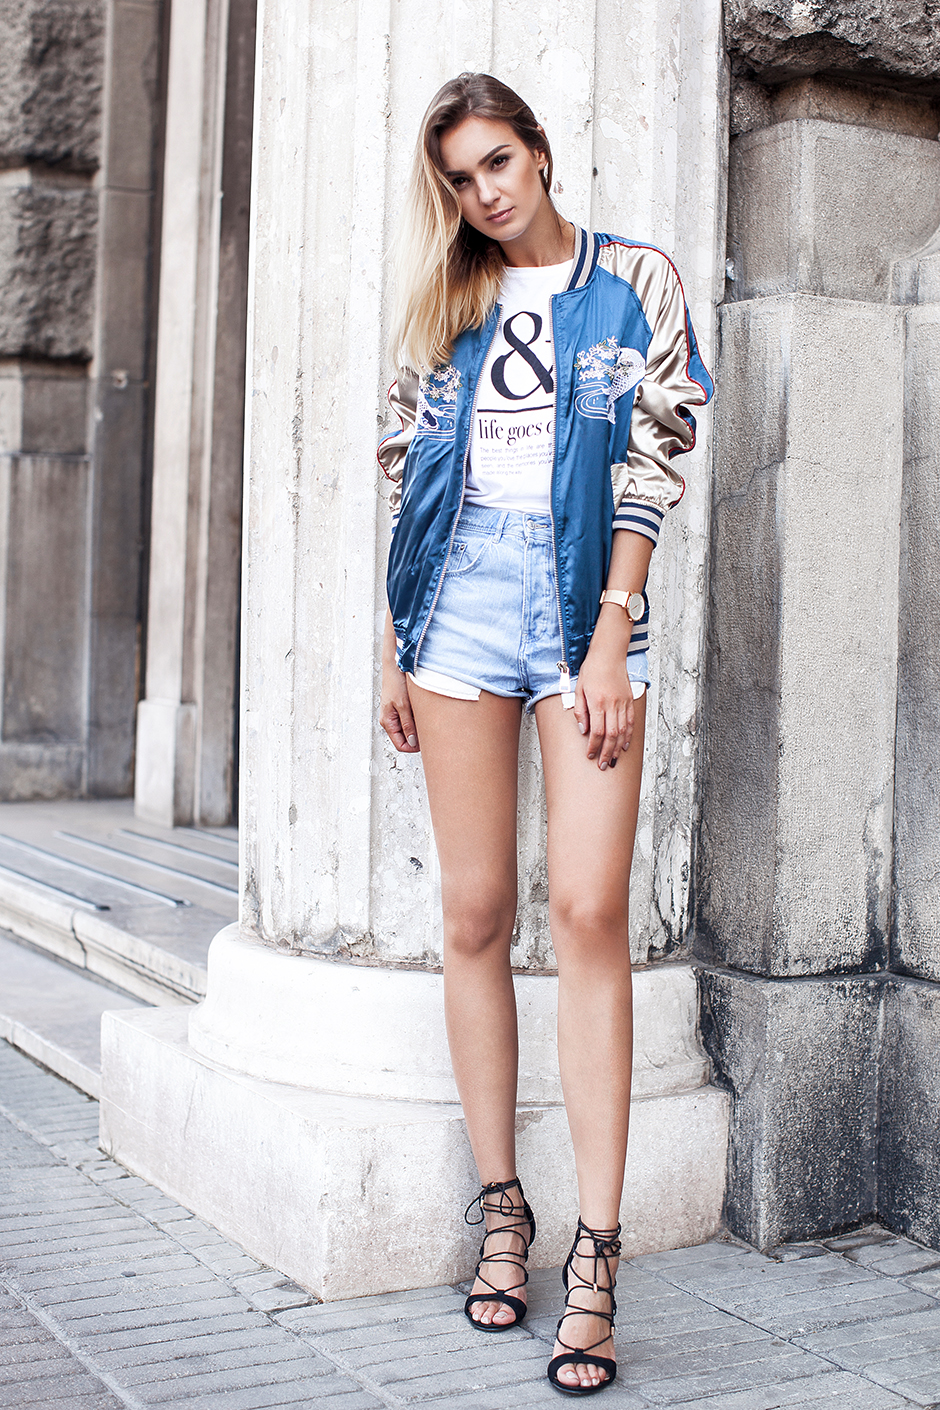 denim-cutoffs-heels-bomber-jacket-outfit-street-style